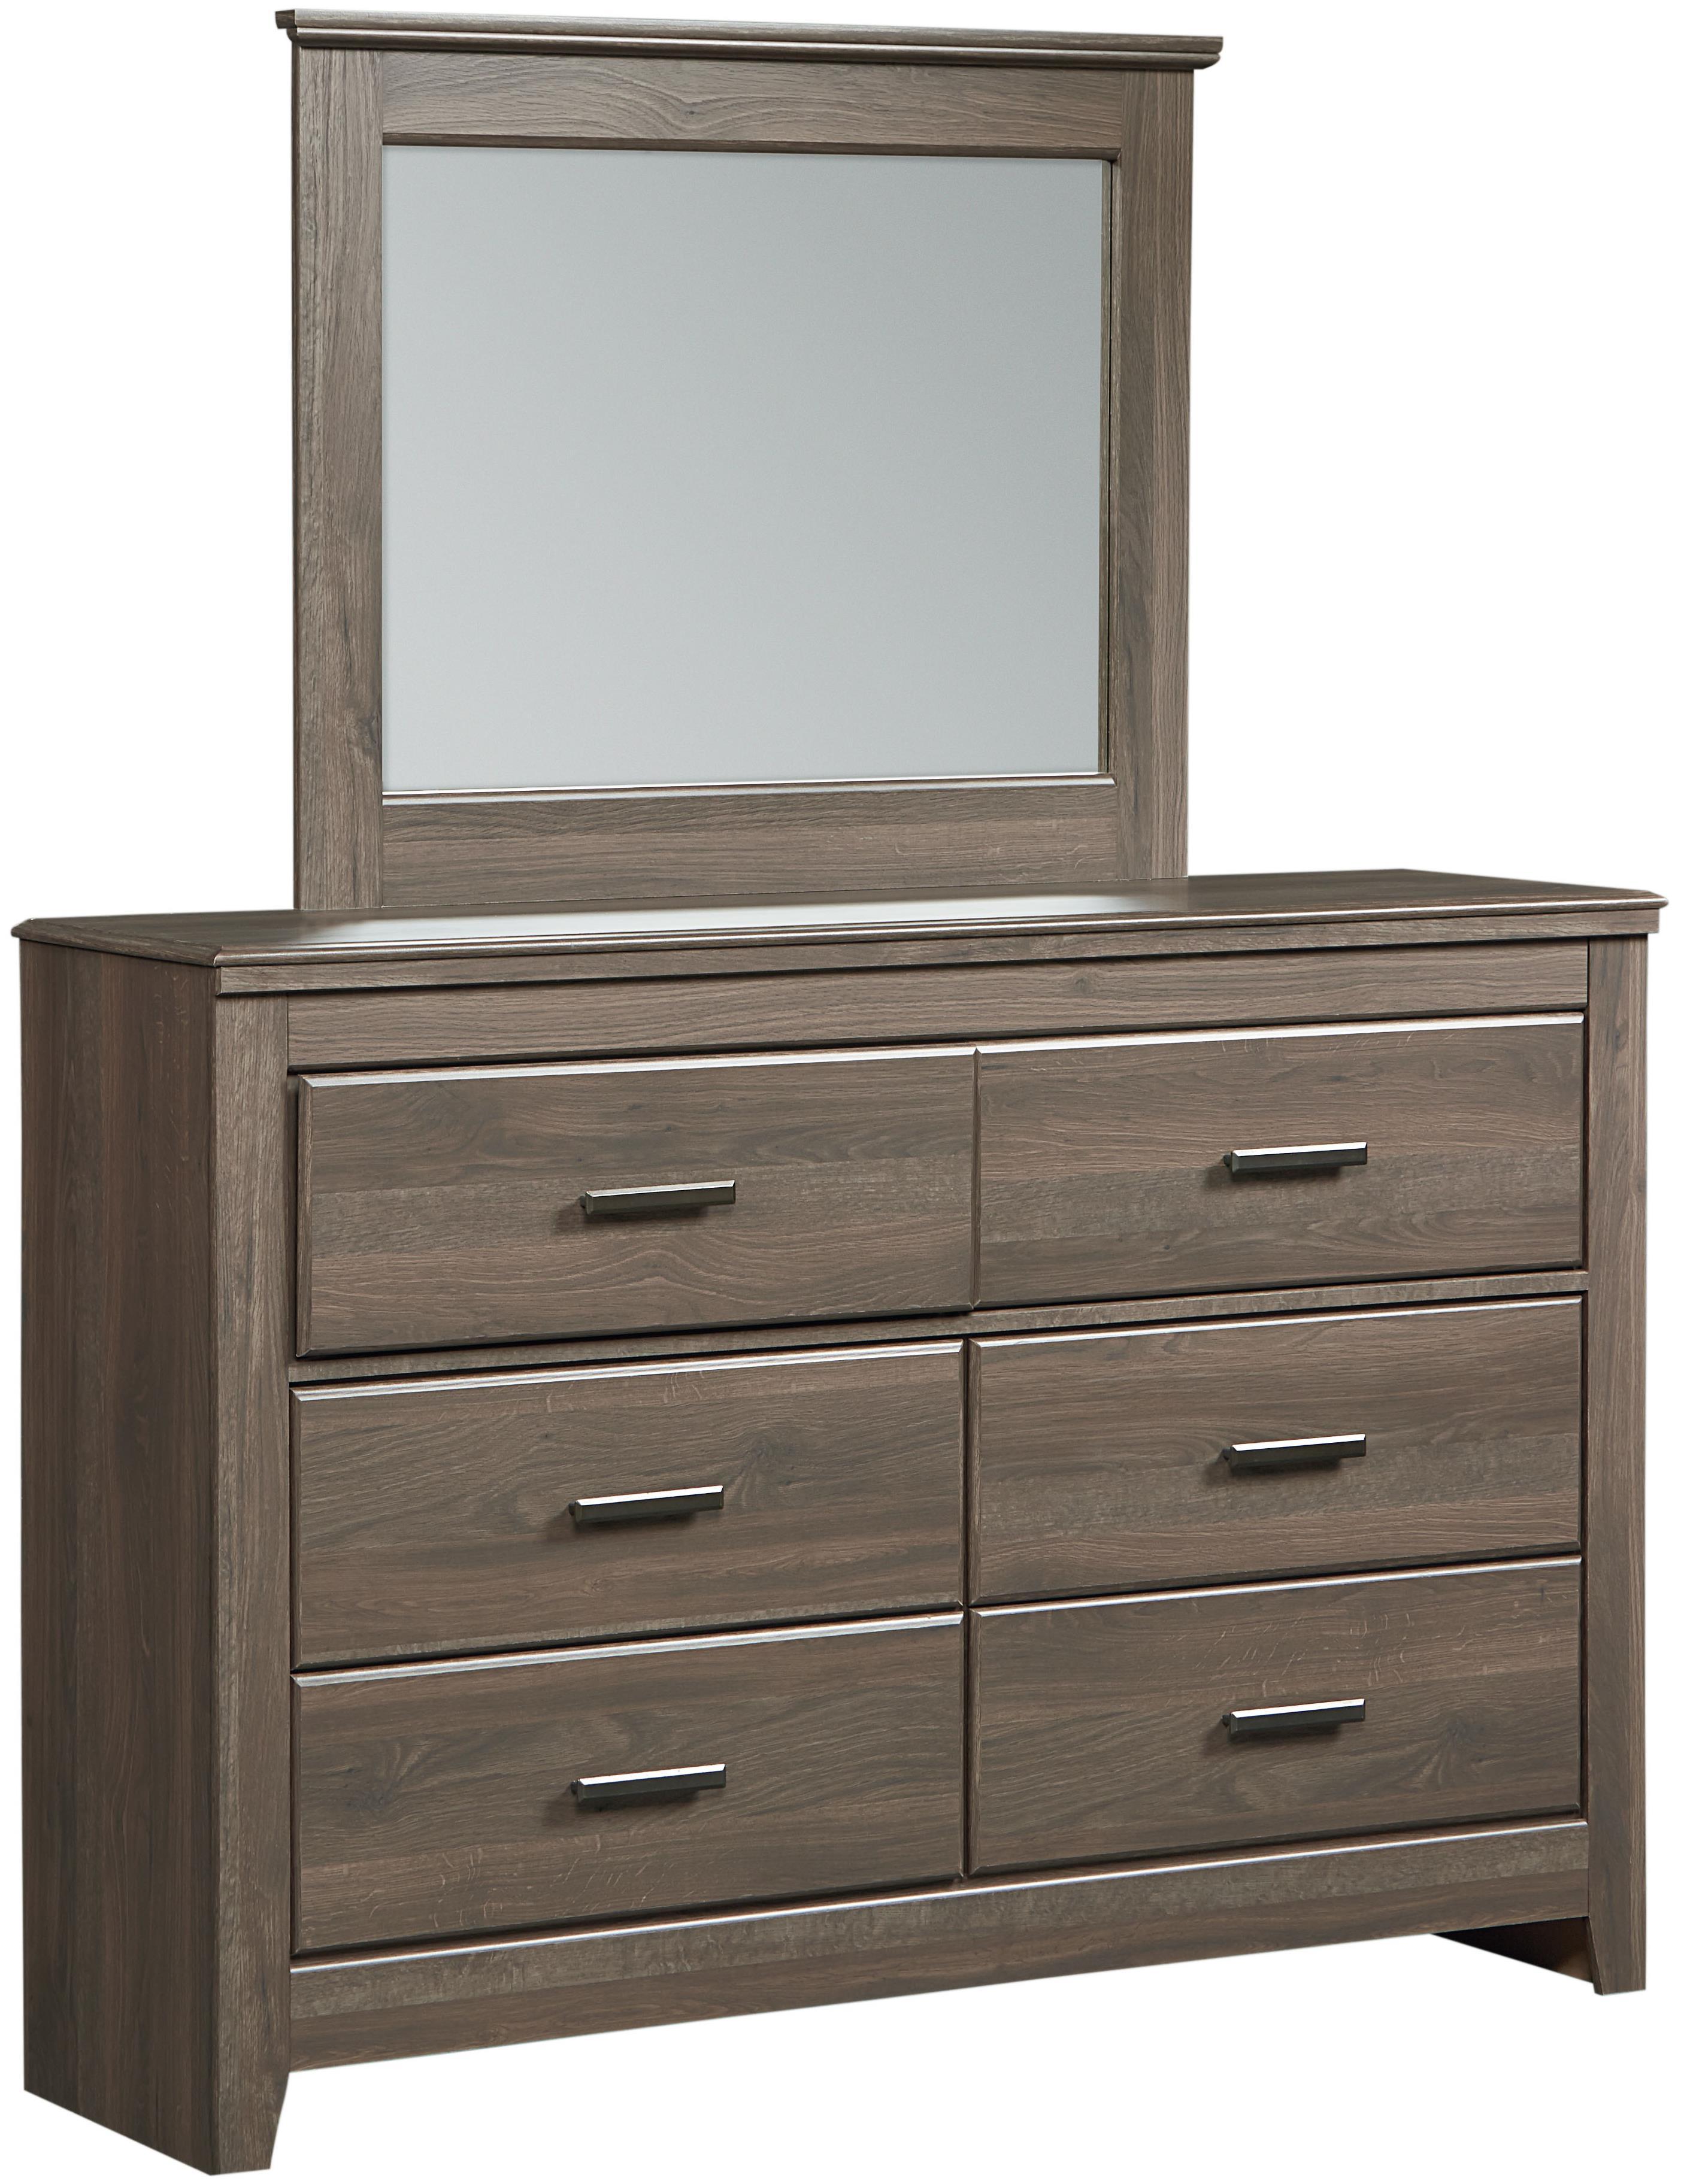 Standard Furniture Hayward Dresser + Mirror - Item Number: 56509+18